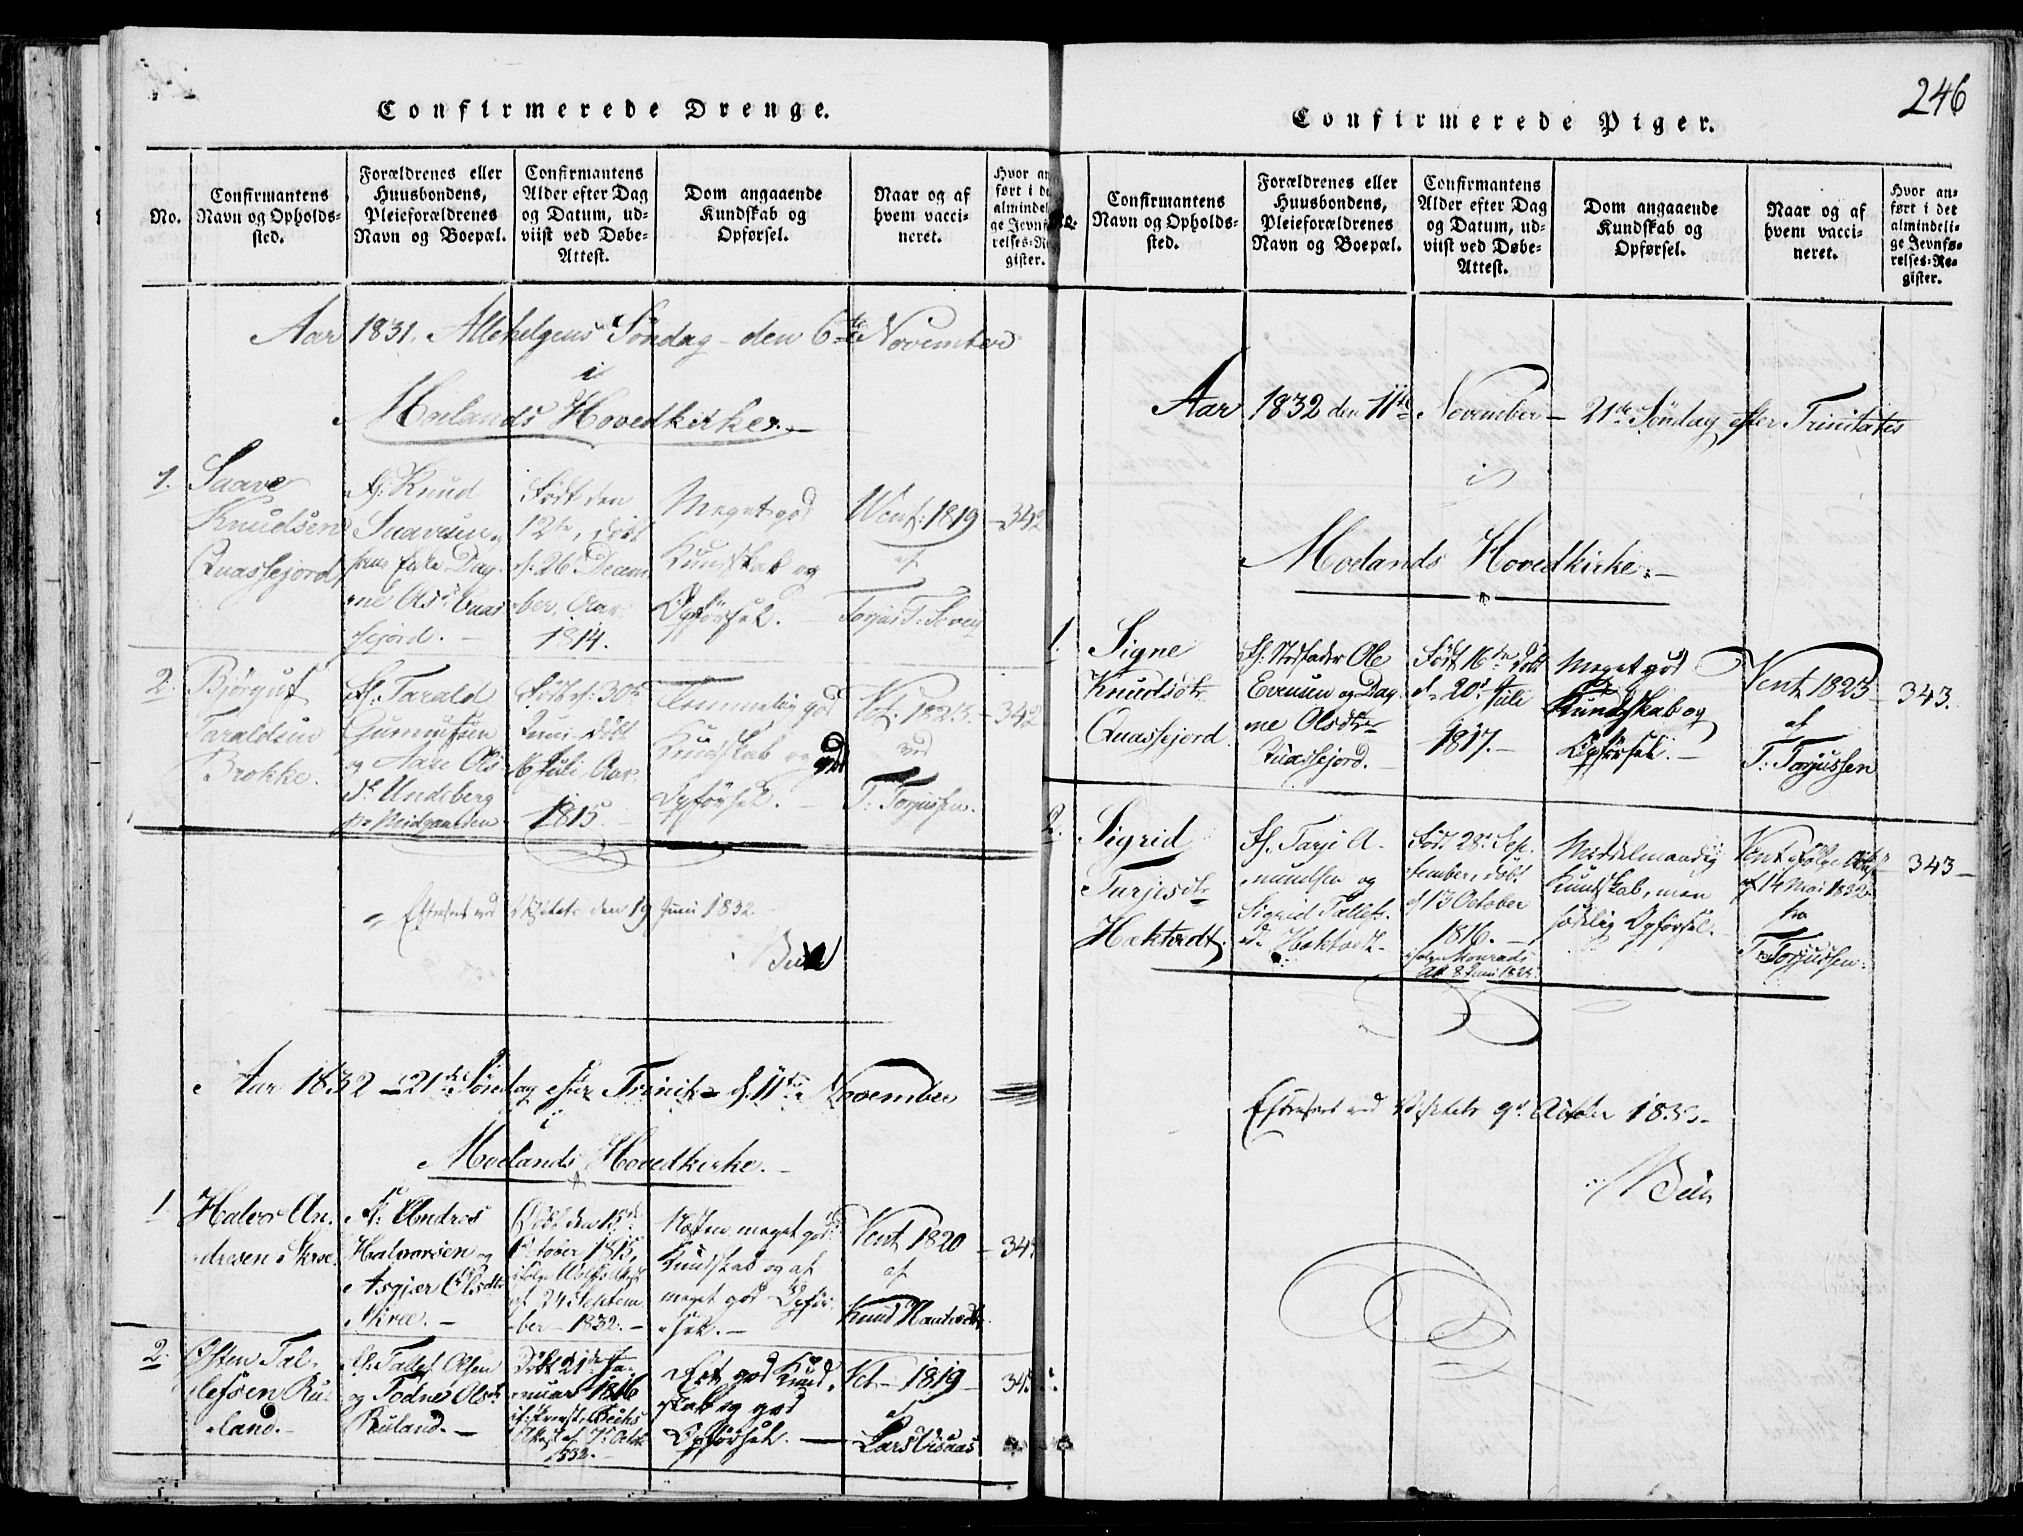 SAKO, Fyresdal kirkebøker, F/Fb/L0001: Ministerialbok nr. II 1, 1815-1854, s. 246